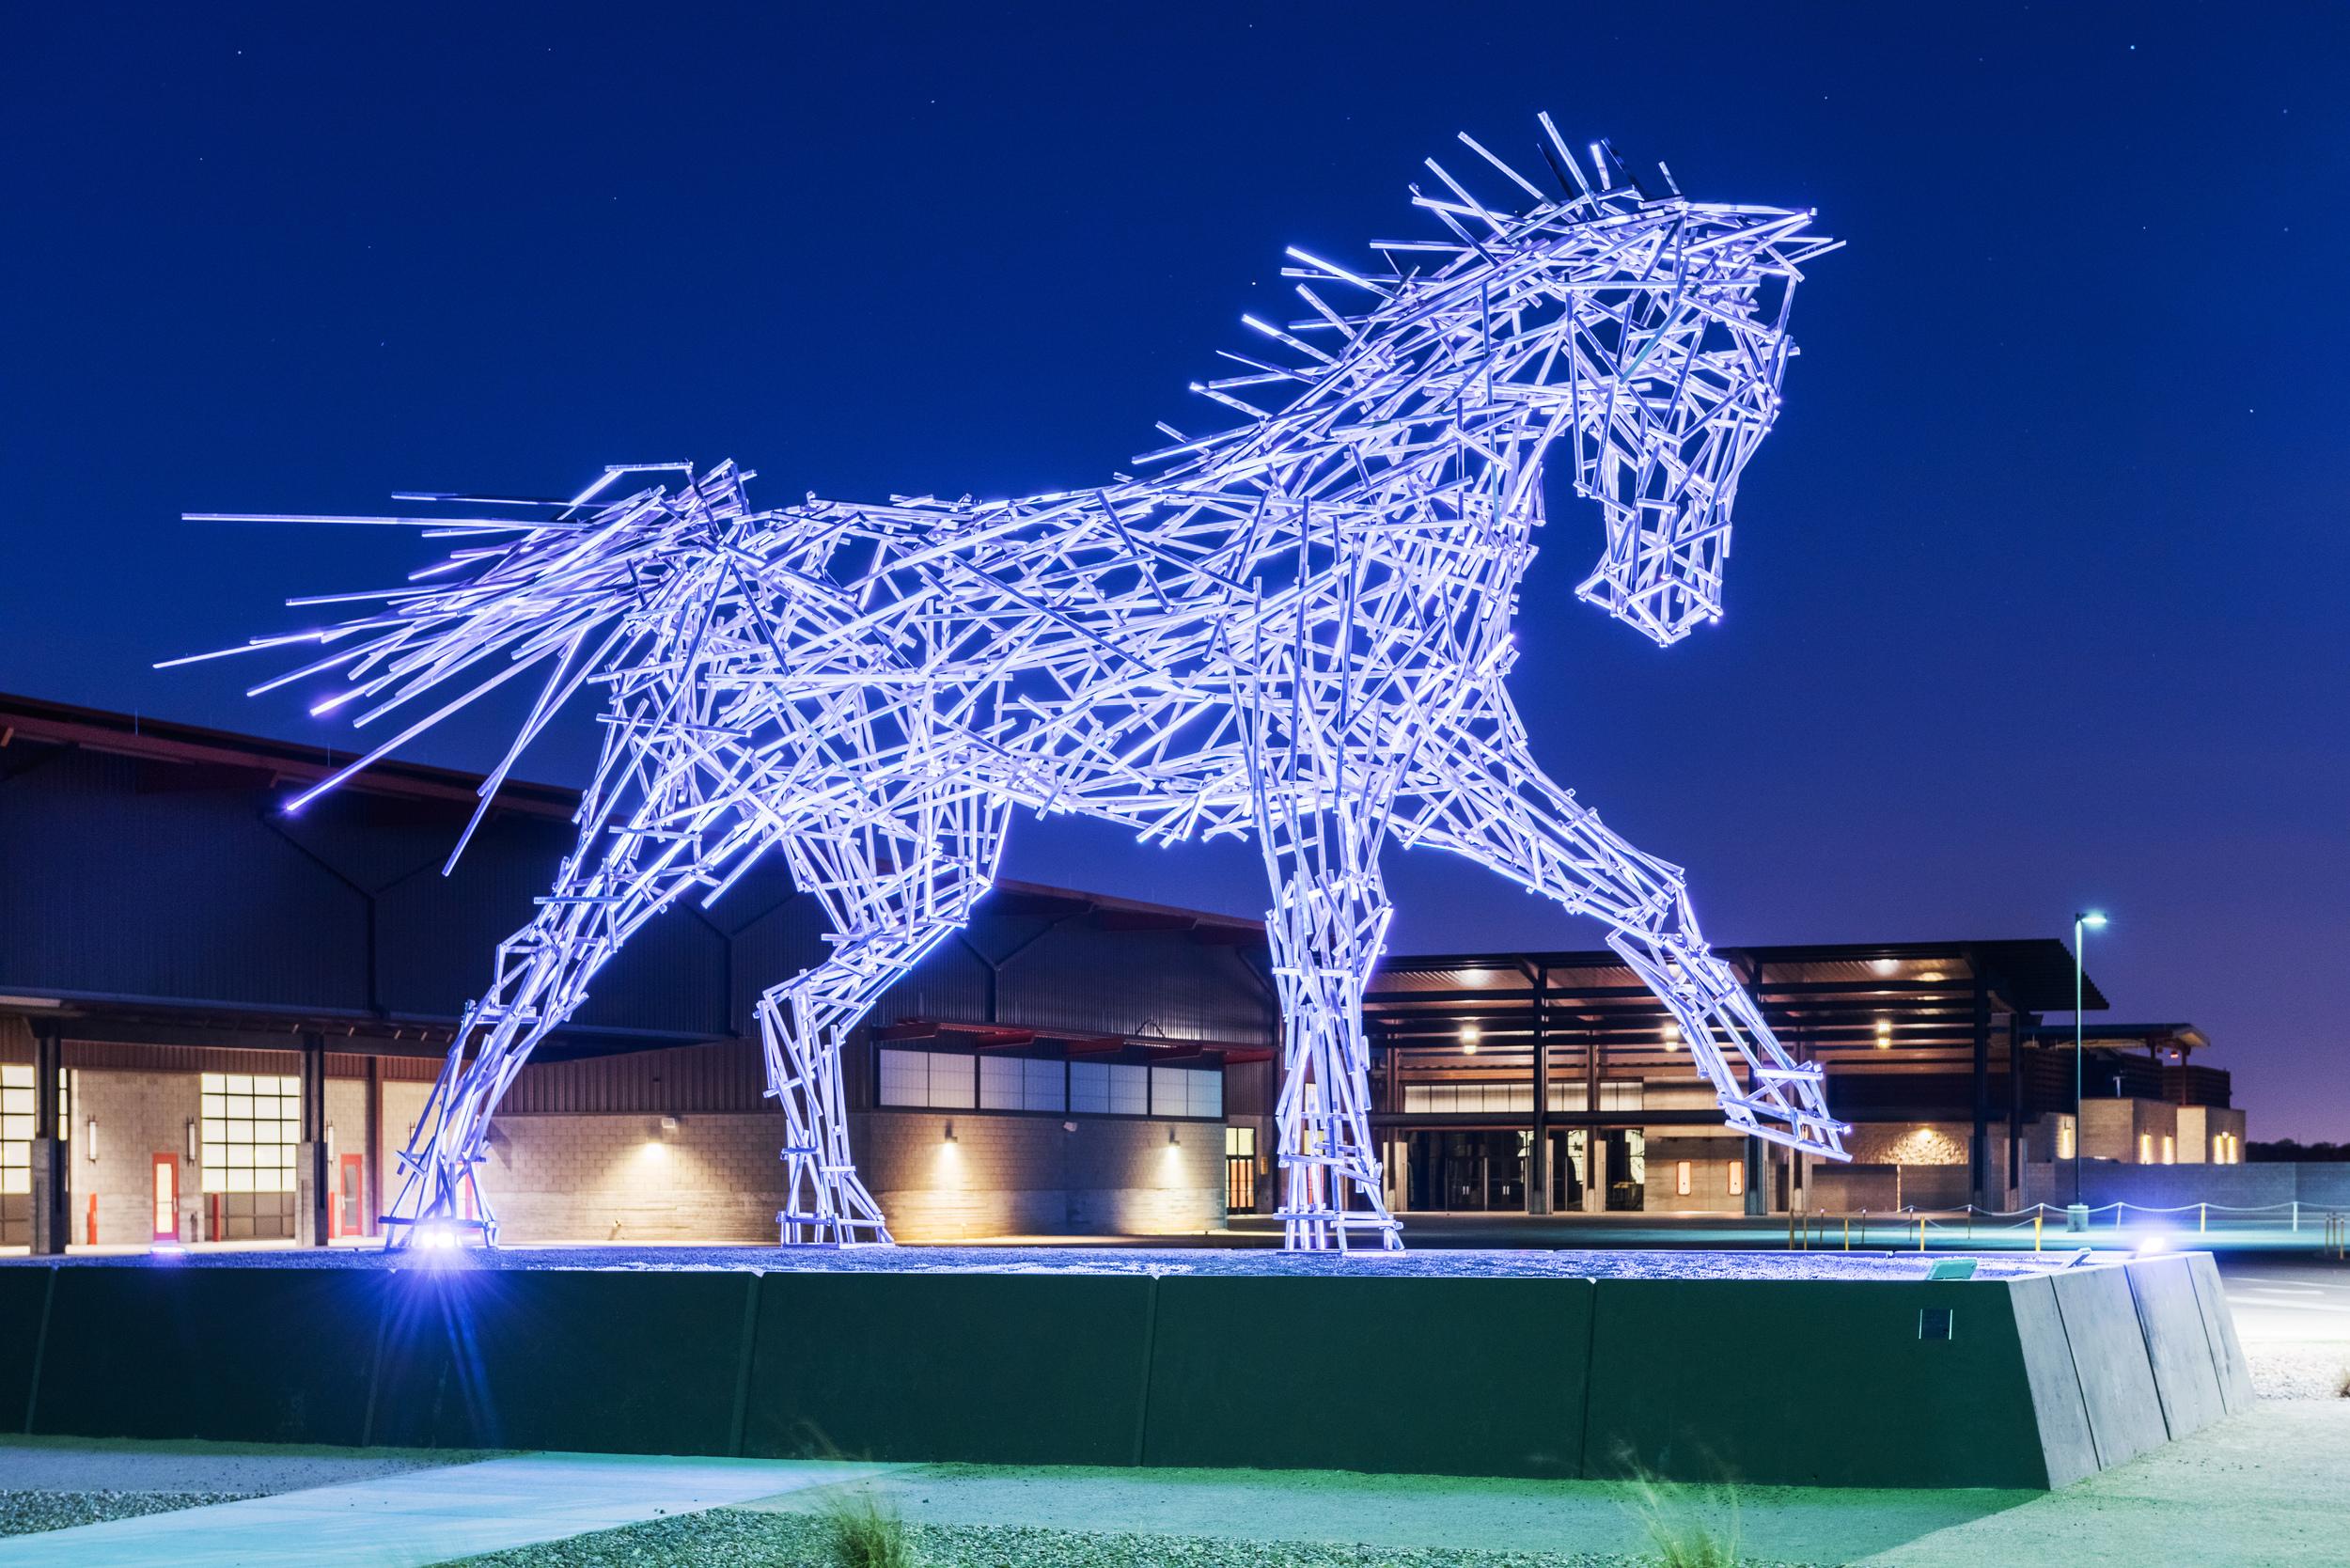 Westworld Of Scottsdale Horse Trailer Living Quarters Wiring Diagram Nhwinckx 12